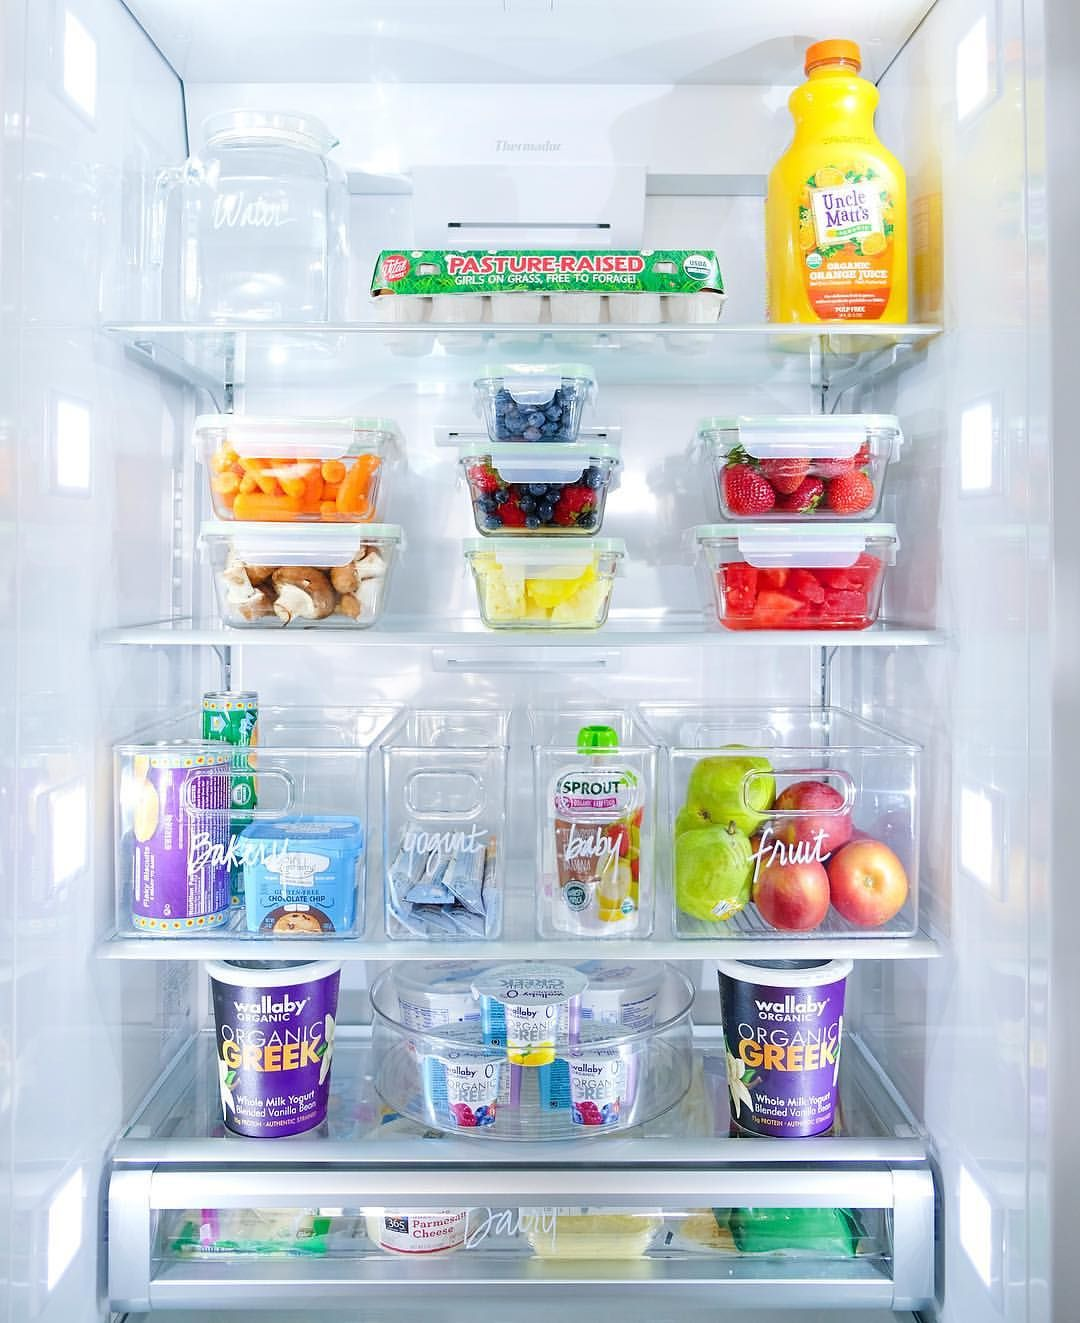 Pin by Olivia f on fridge organization | Pinterest | Fridge ...